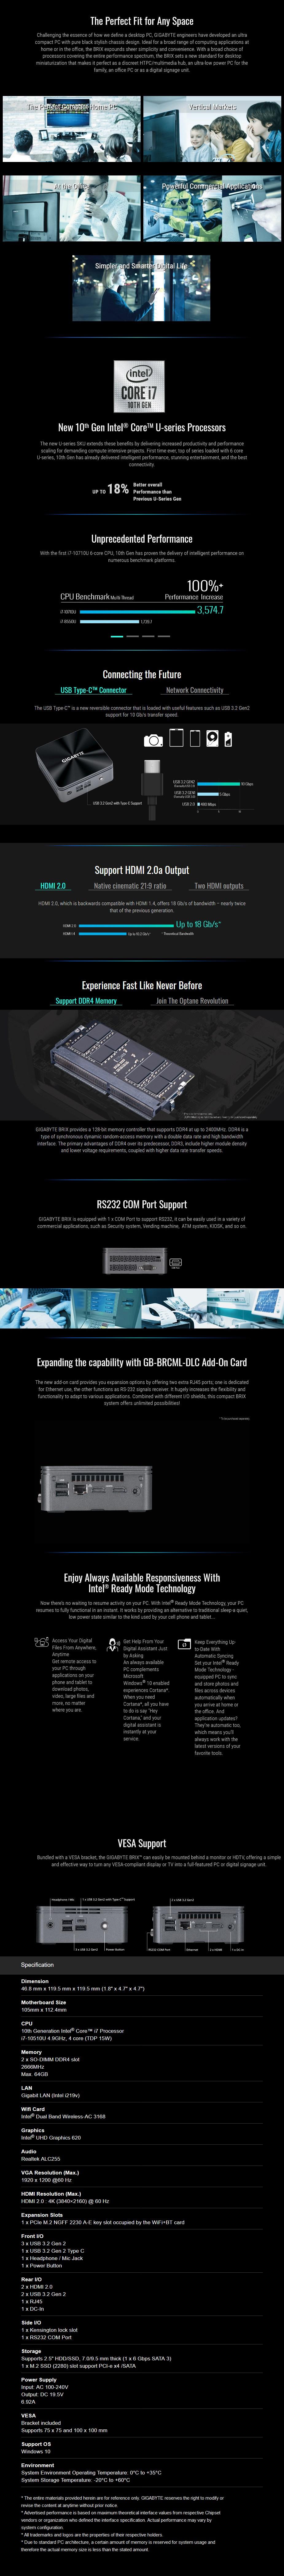 gigabyte_brix_gbbri7h10510_barebone_kit_intel_i710510u_processor_ac37553_7.jpg